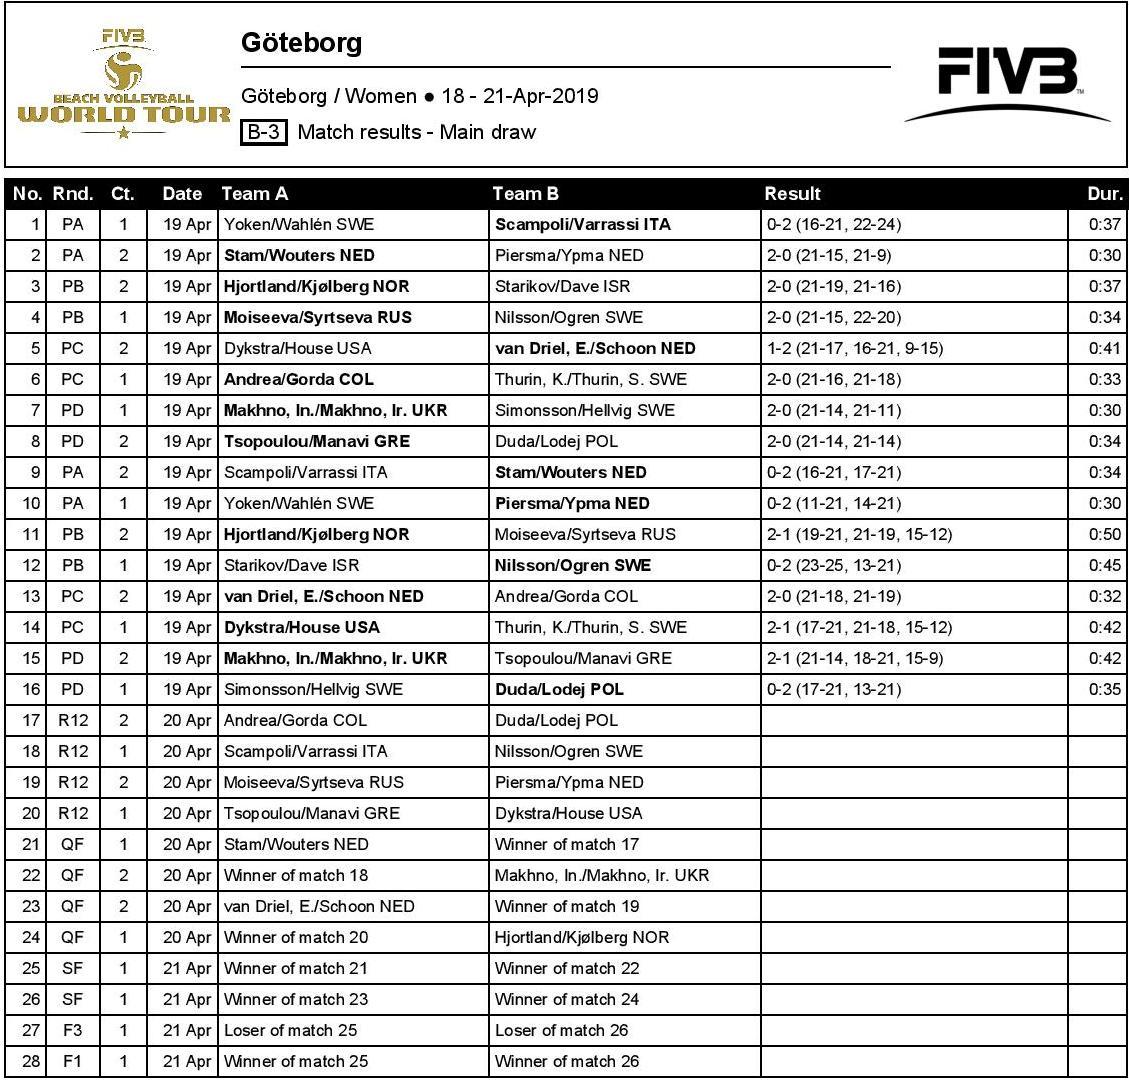 Two Dutch pairs straight into Gothenburg quarterfinals - Göteborg